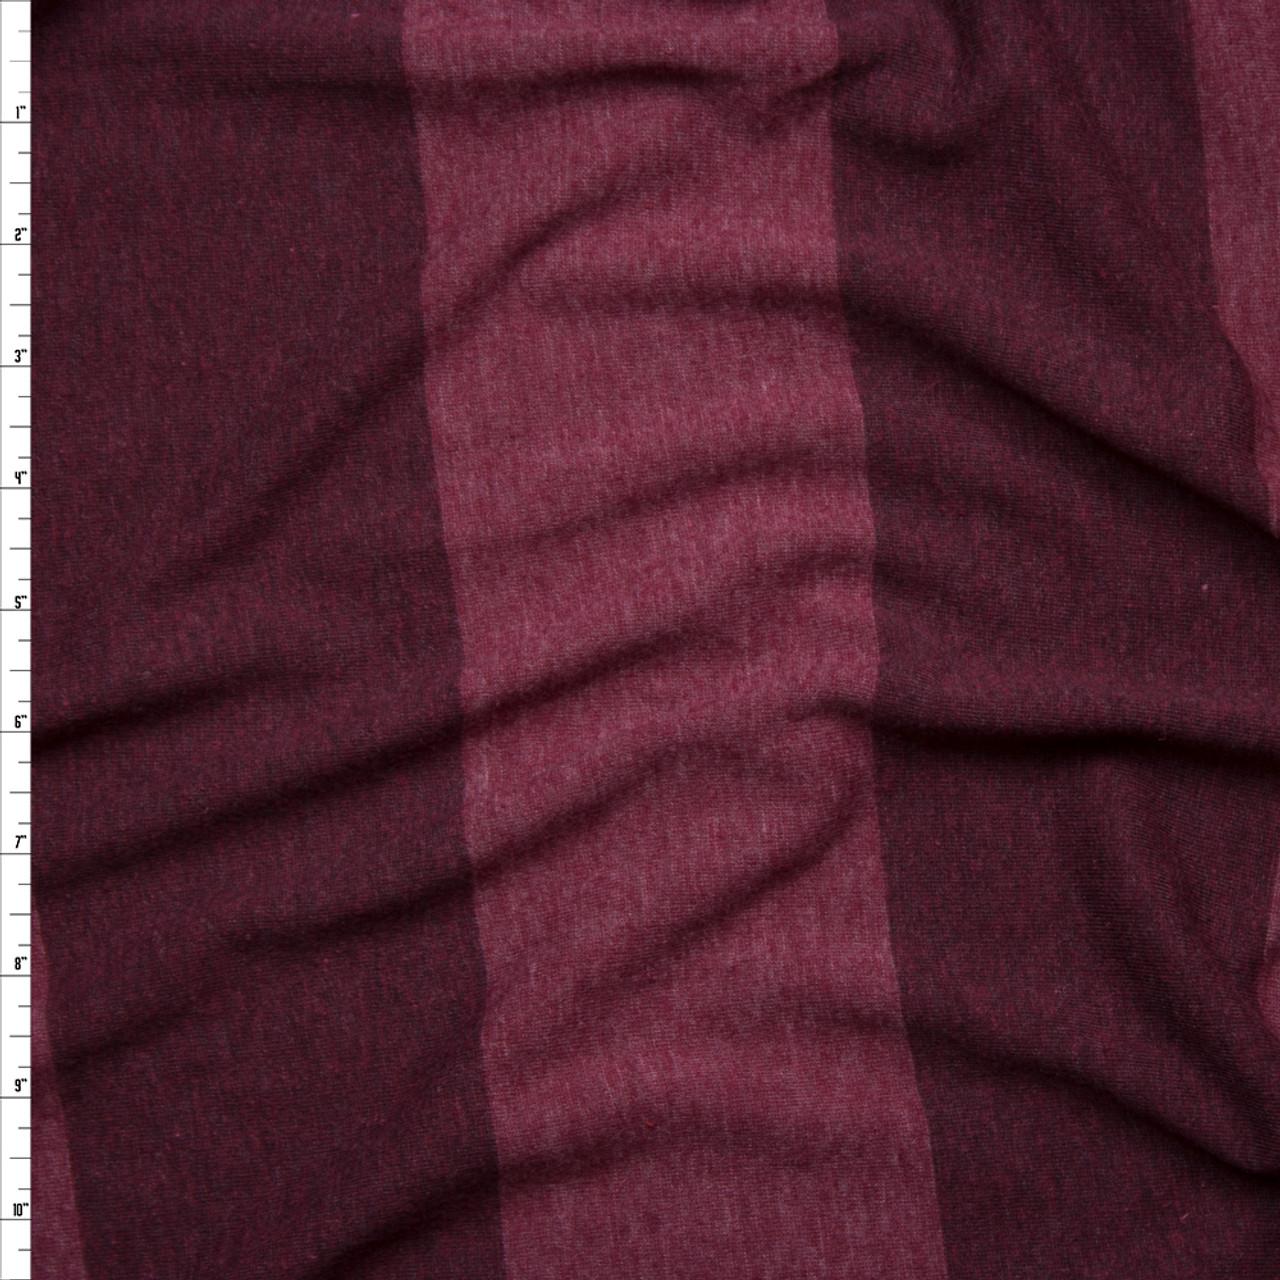 f0987d67911 Cali Fabrics Wine Wide Stripe Lightweight Jersey Knit Fabric by the Yard